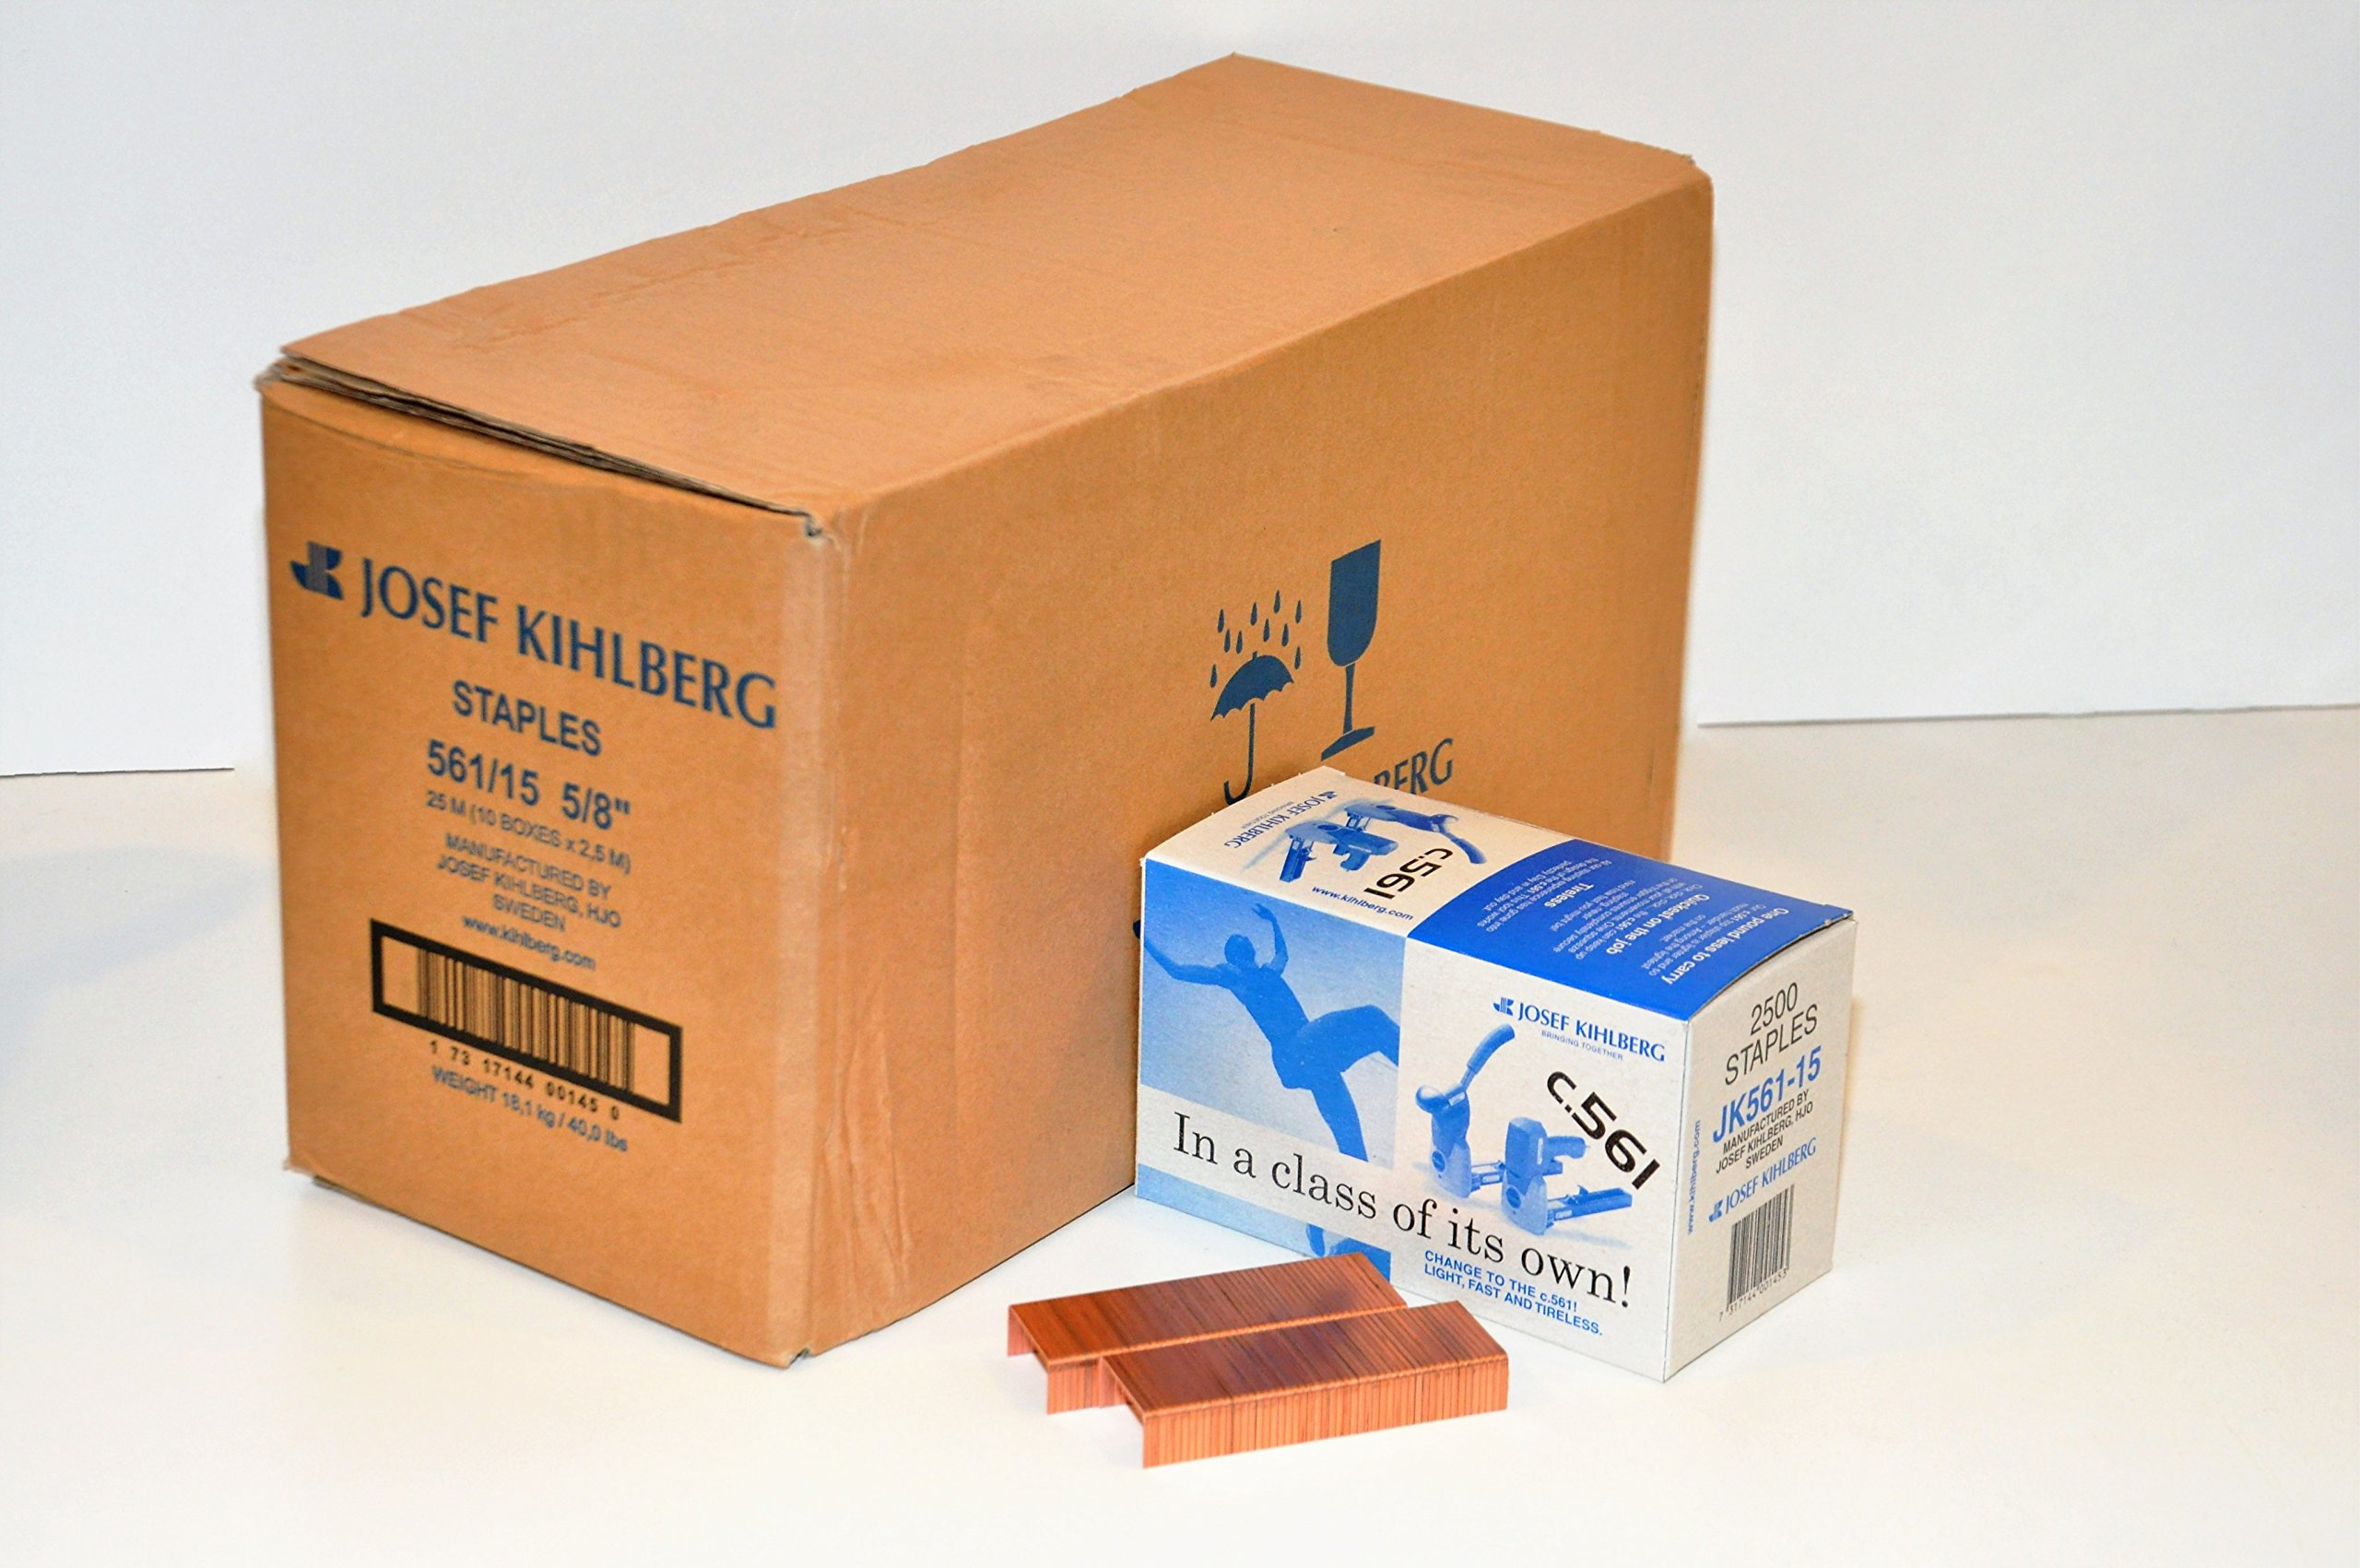 JOSEF KIHLBERG JK561-15K 5/8'' Wide Crown Carton Staple, L.F.